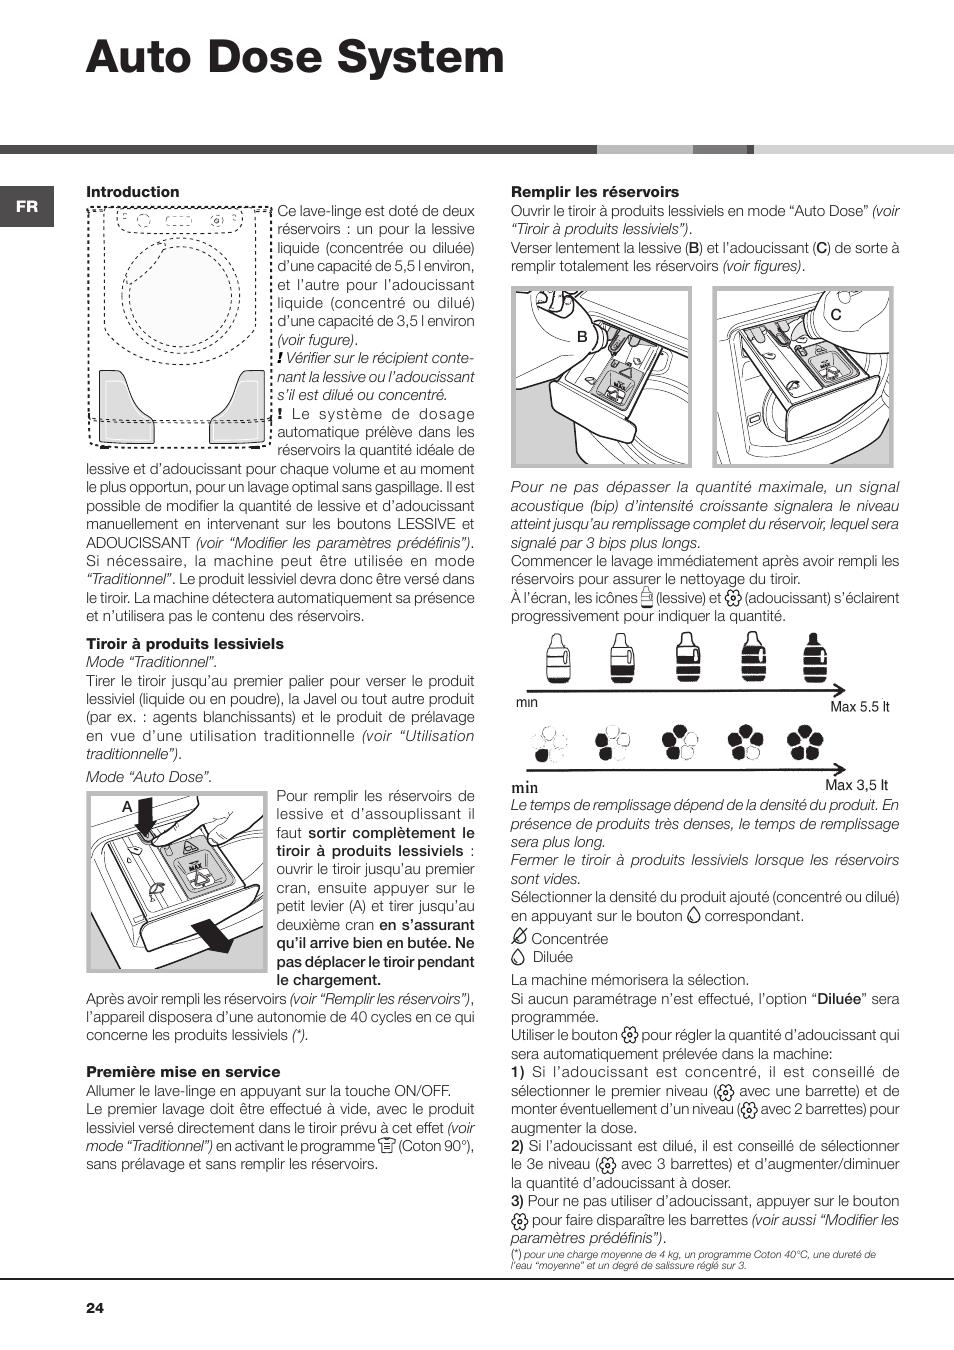 Auto dose system | Hotpoint Ariston Aqualtis ADS93D 69 EU-A User Manual |  Page